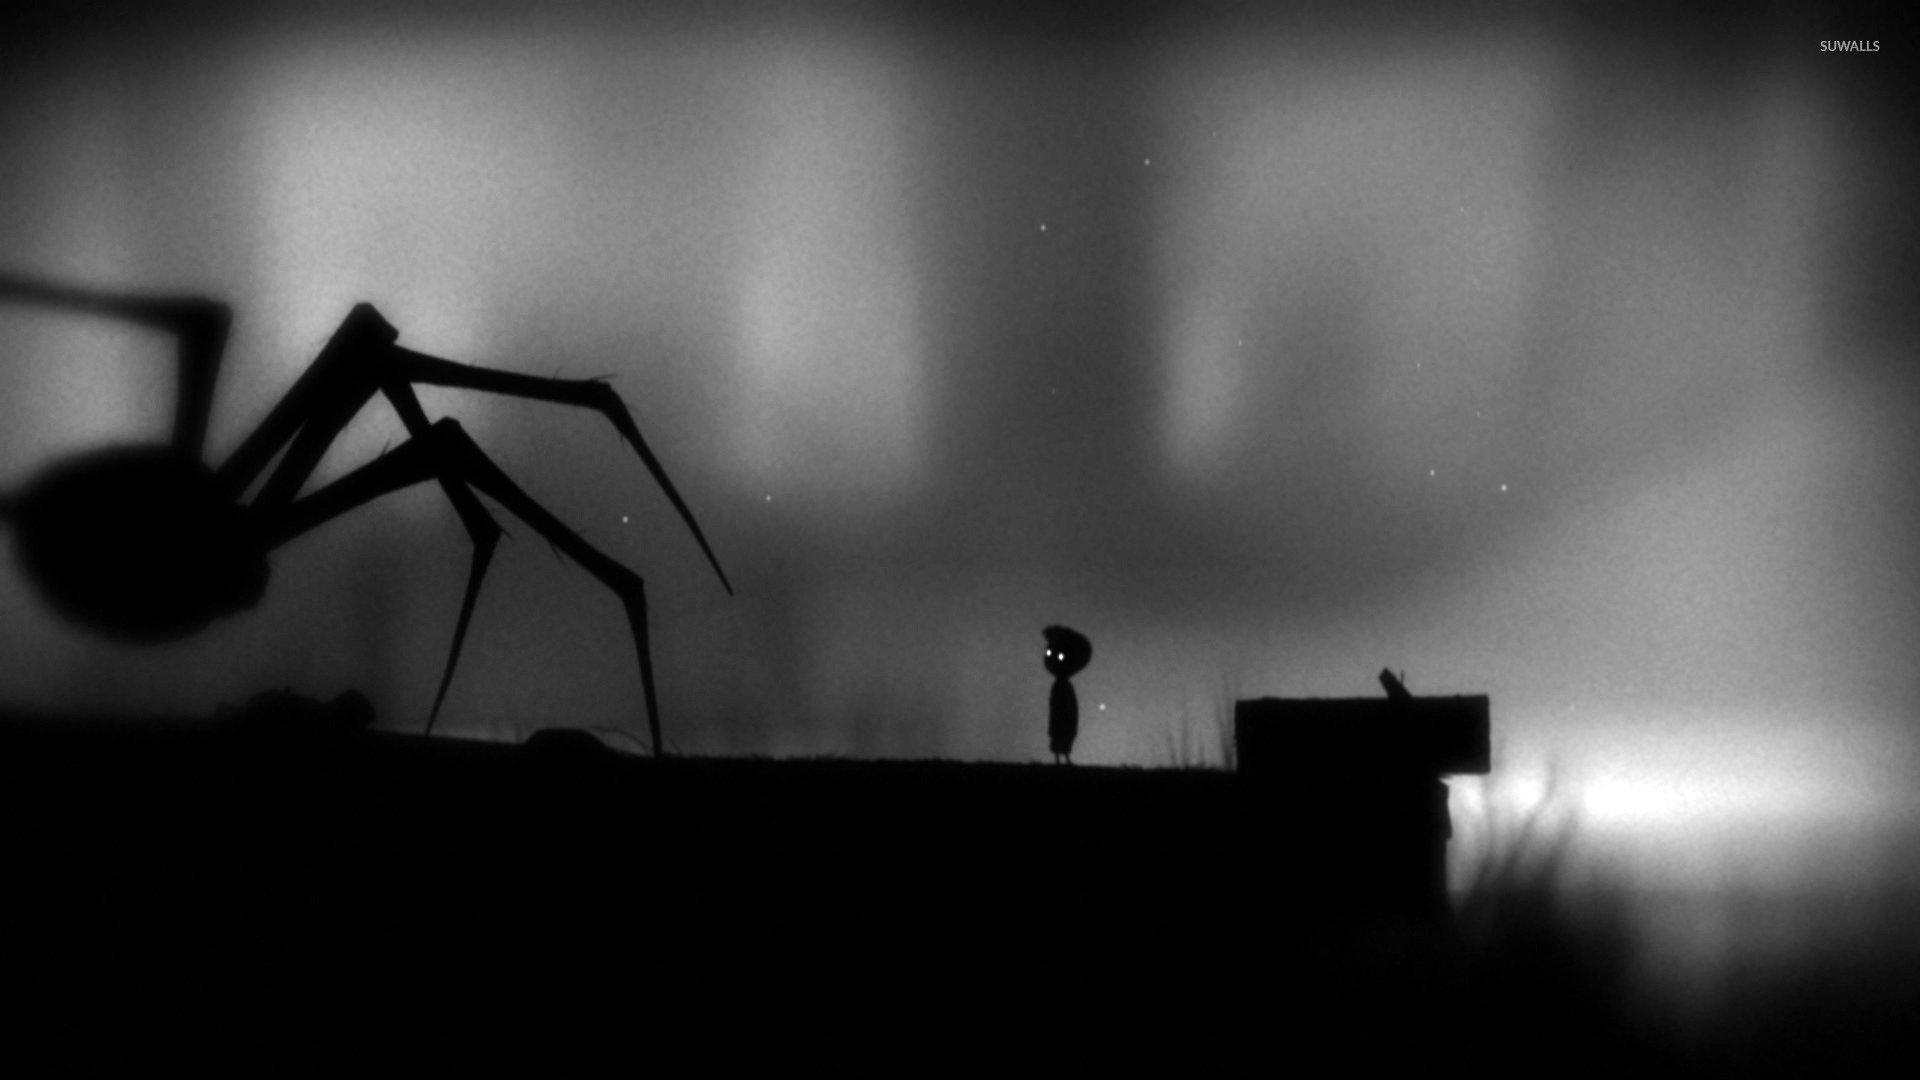 Обои playdead, microsoft game studios, паук, playdead studios, limbo. Игры foto 14